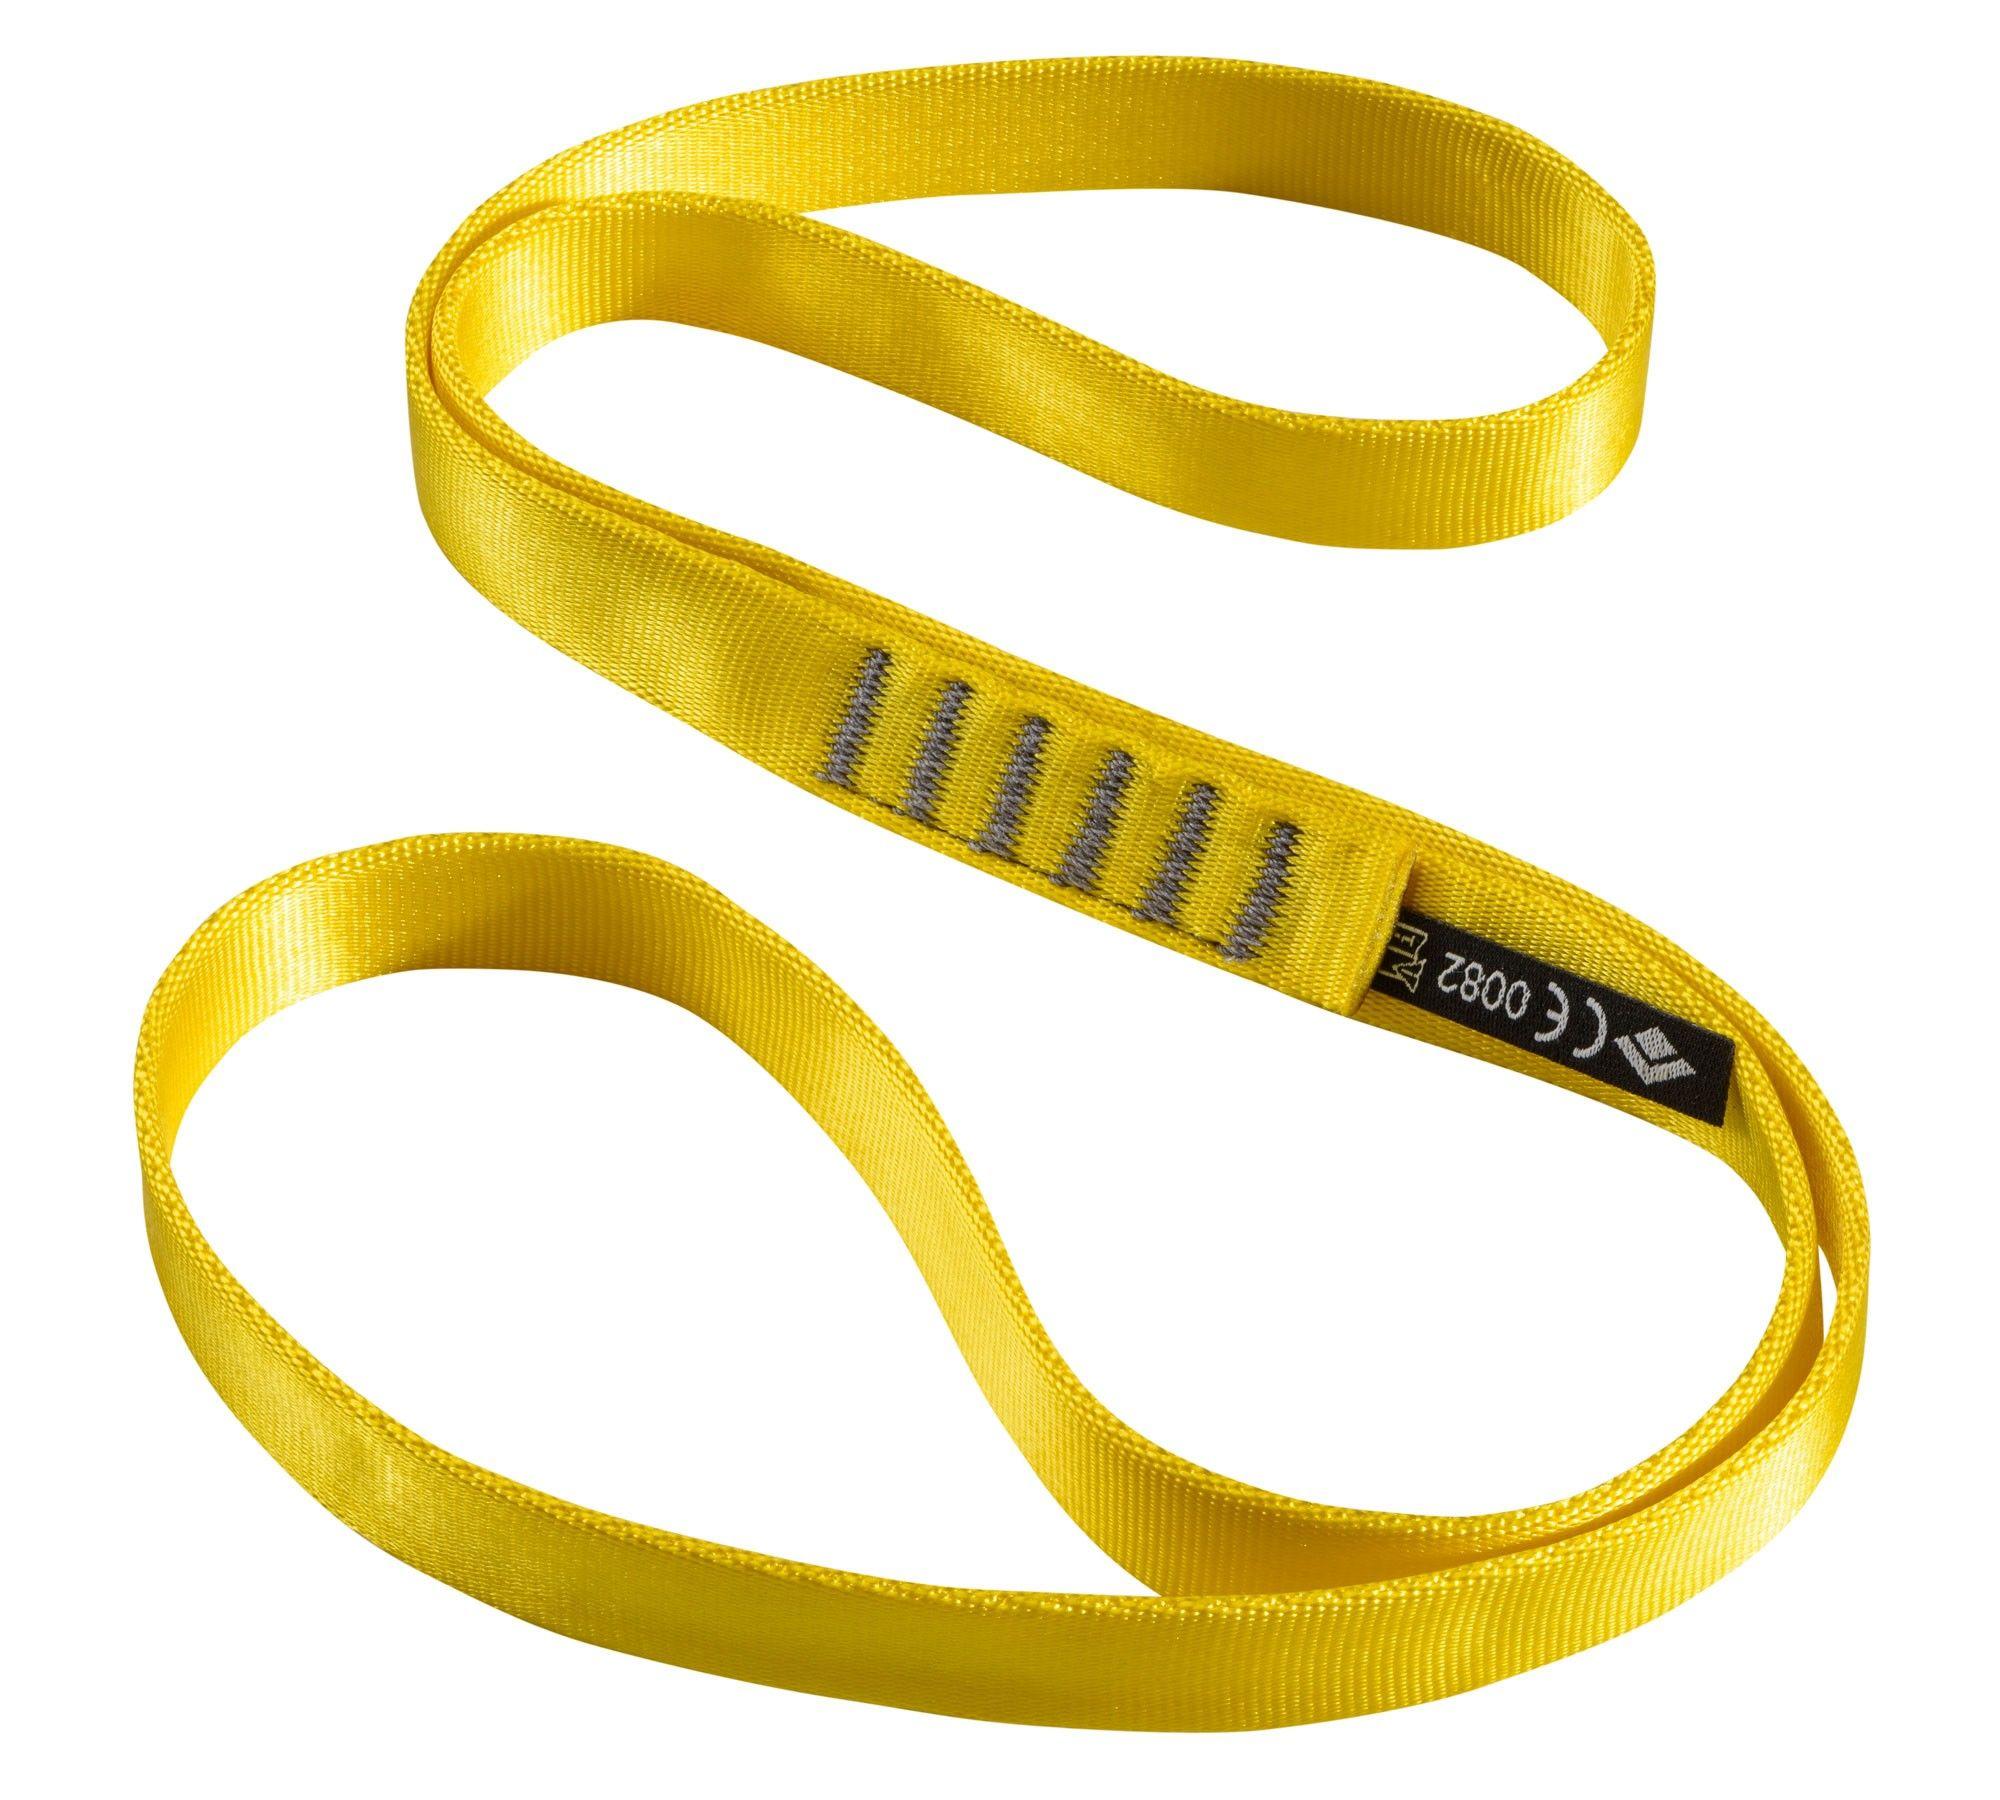 Black Diamond 18 MM Nylon Runners 60 CM, Yellow |  Kletterausrüstung